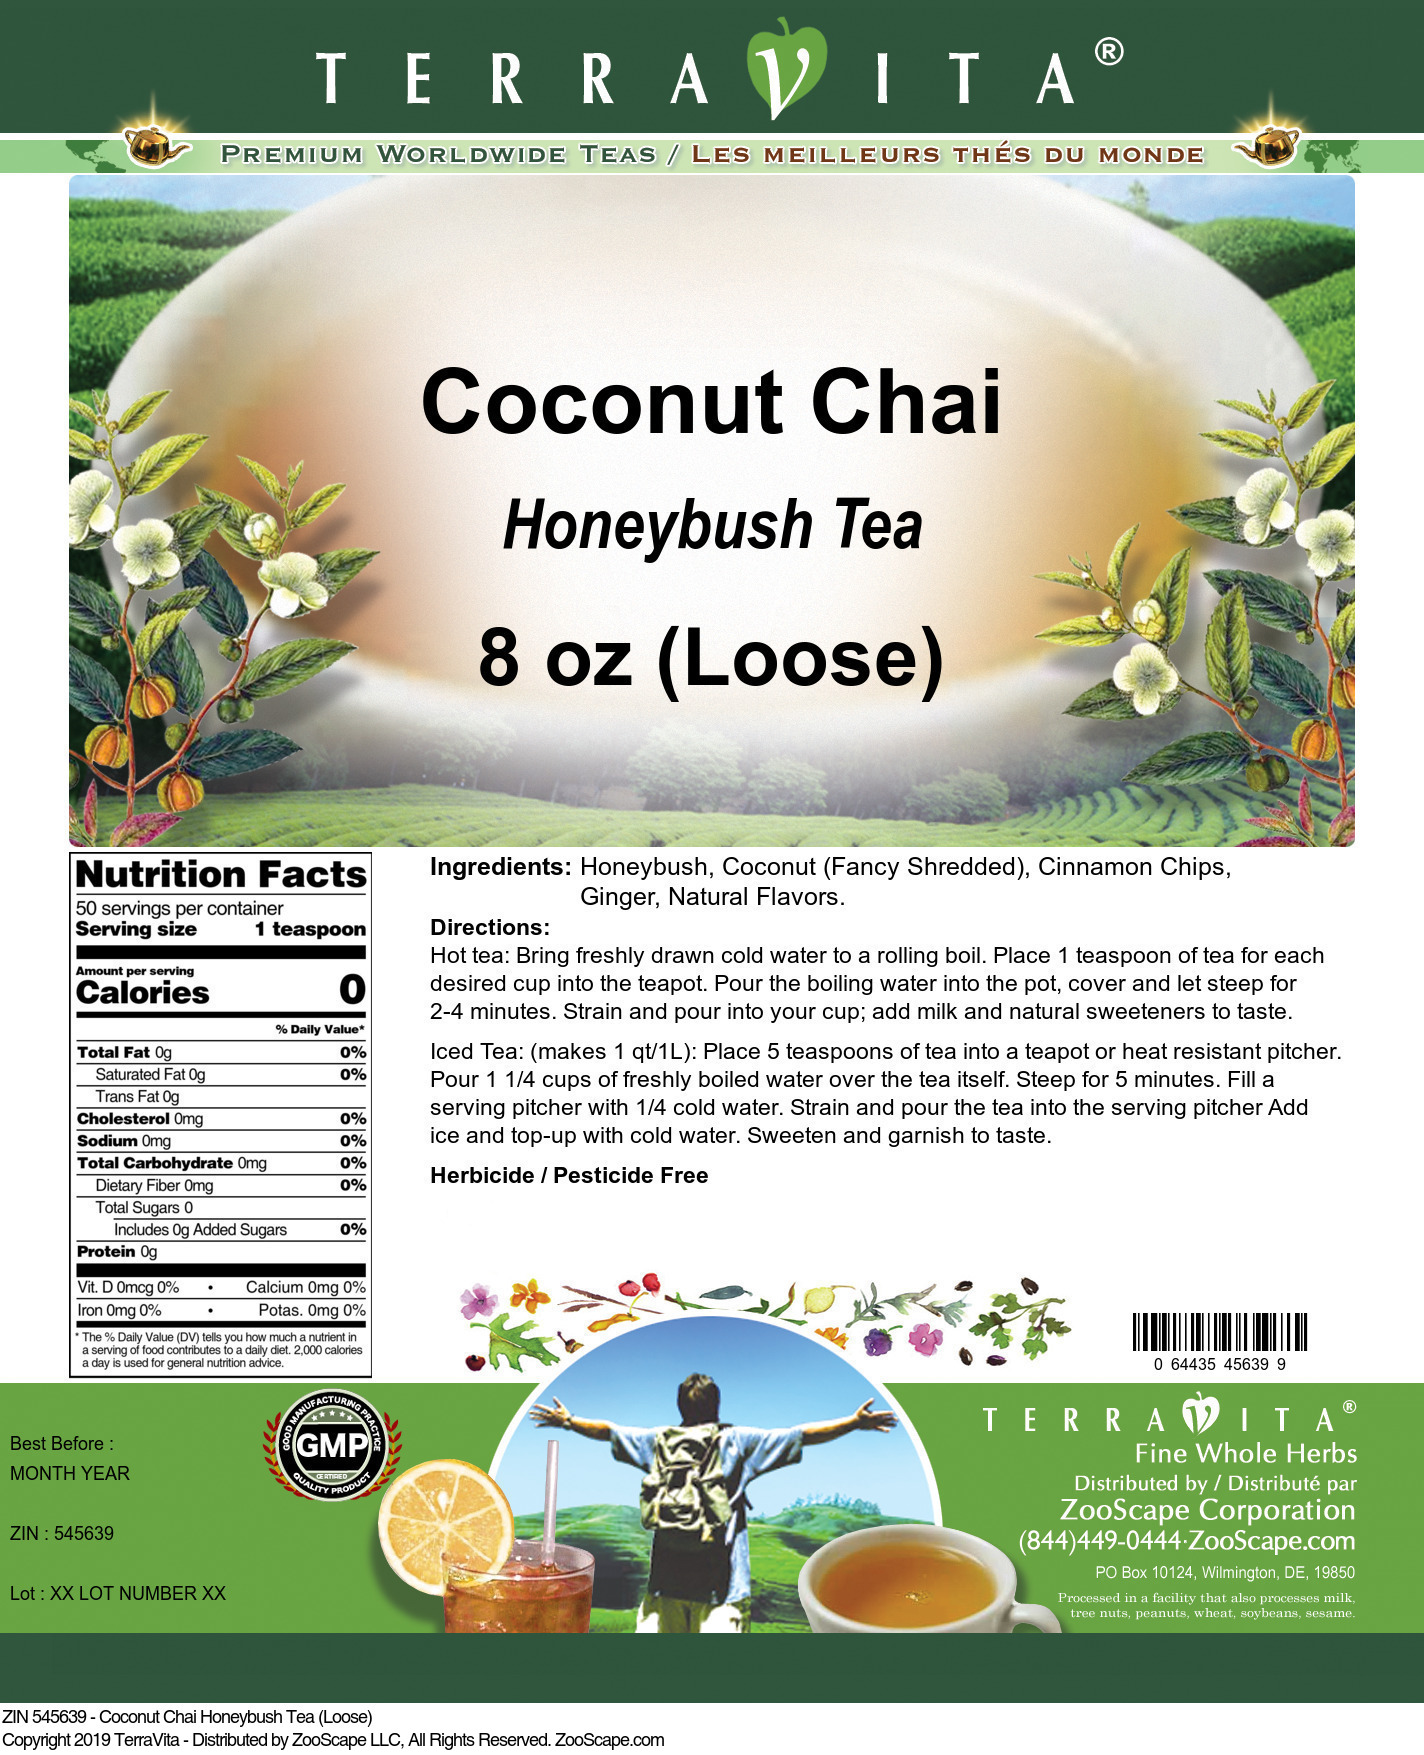 Coconut Chai Honeybush Tea (Loose)